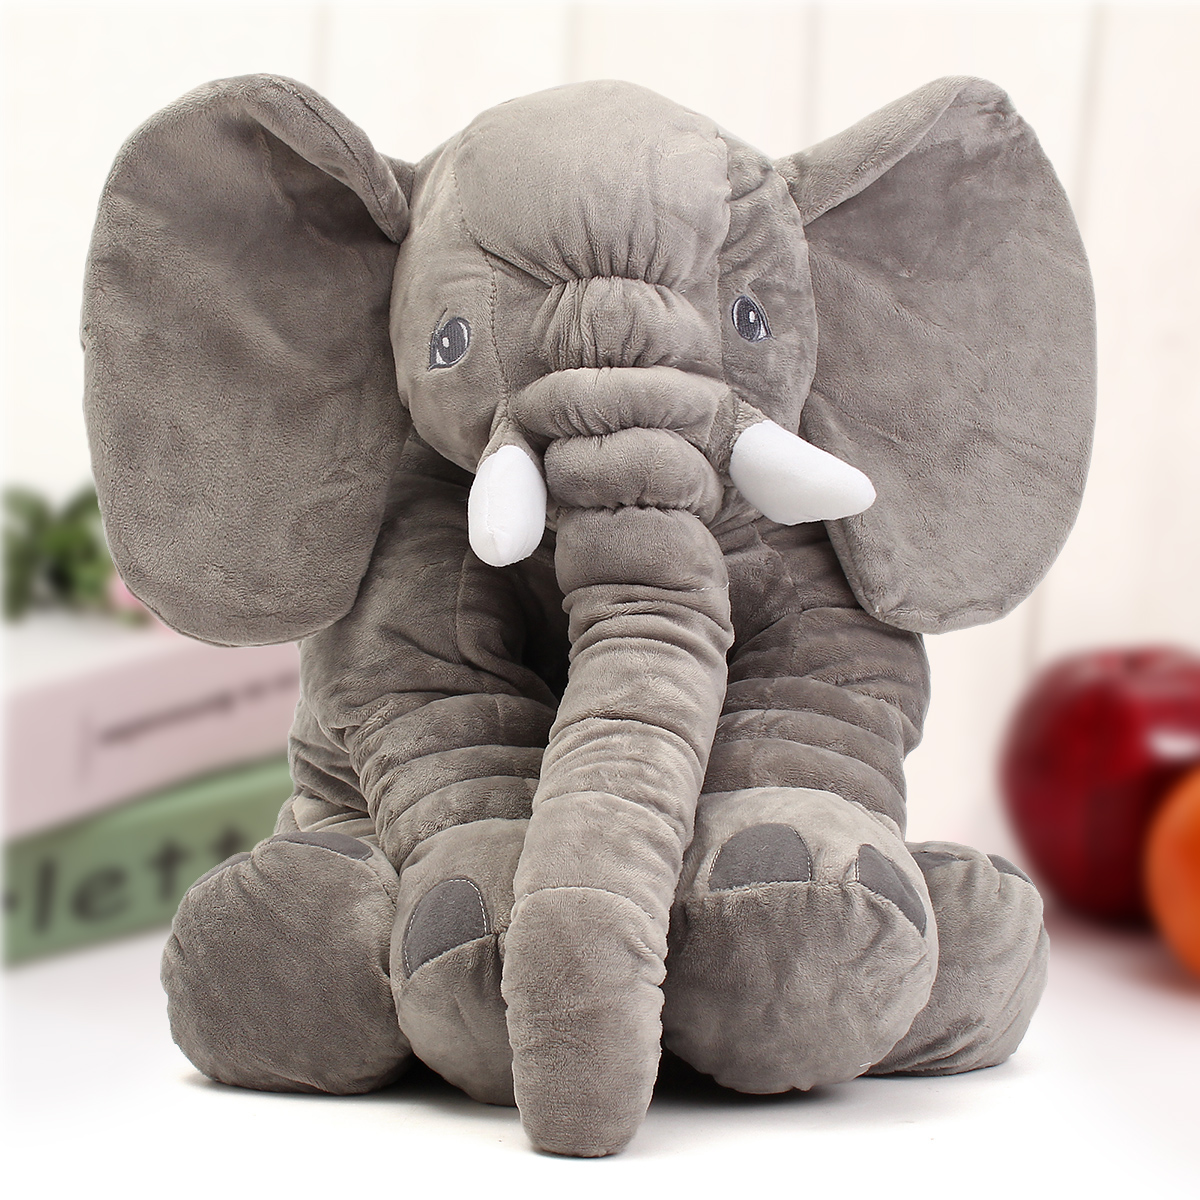 Soft Plush Toys : ″ cm cute jumbo elephant plush doll stuffed animal